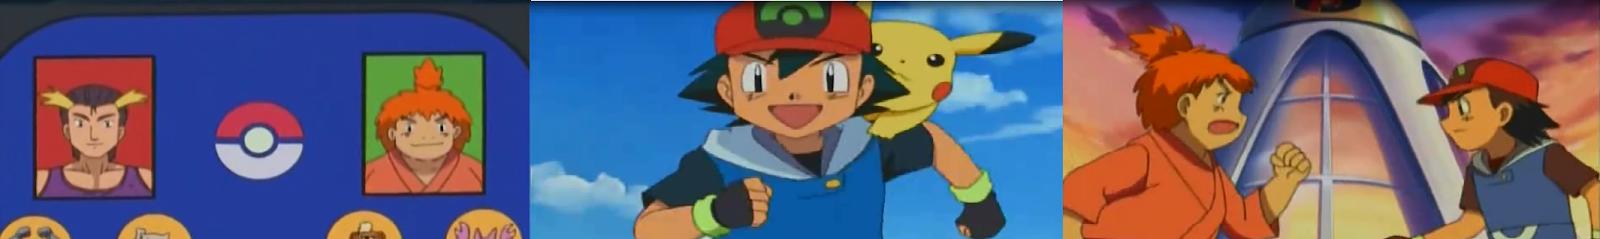 Pokemon Capitulo 34 Temporada 8 De Fanfarrones A Victorioso